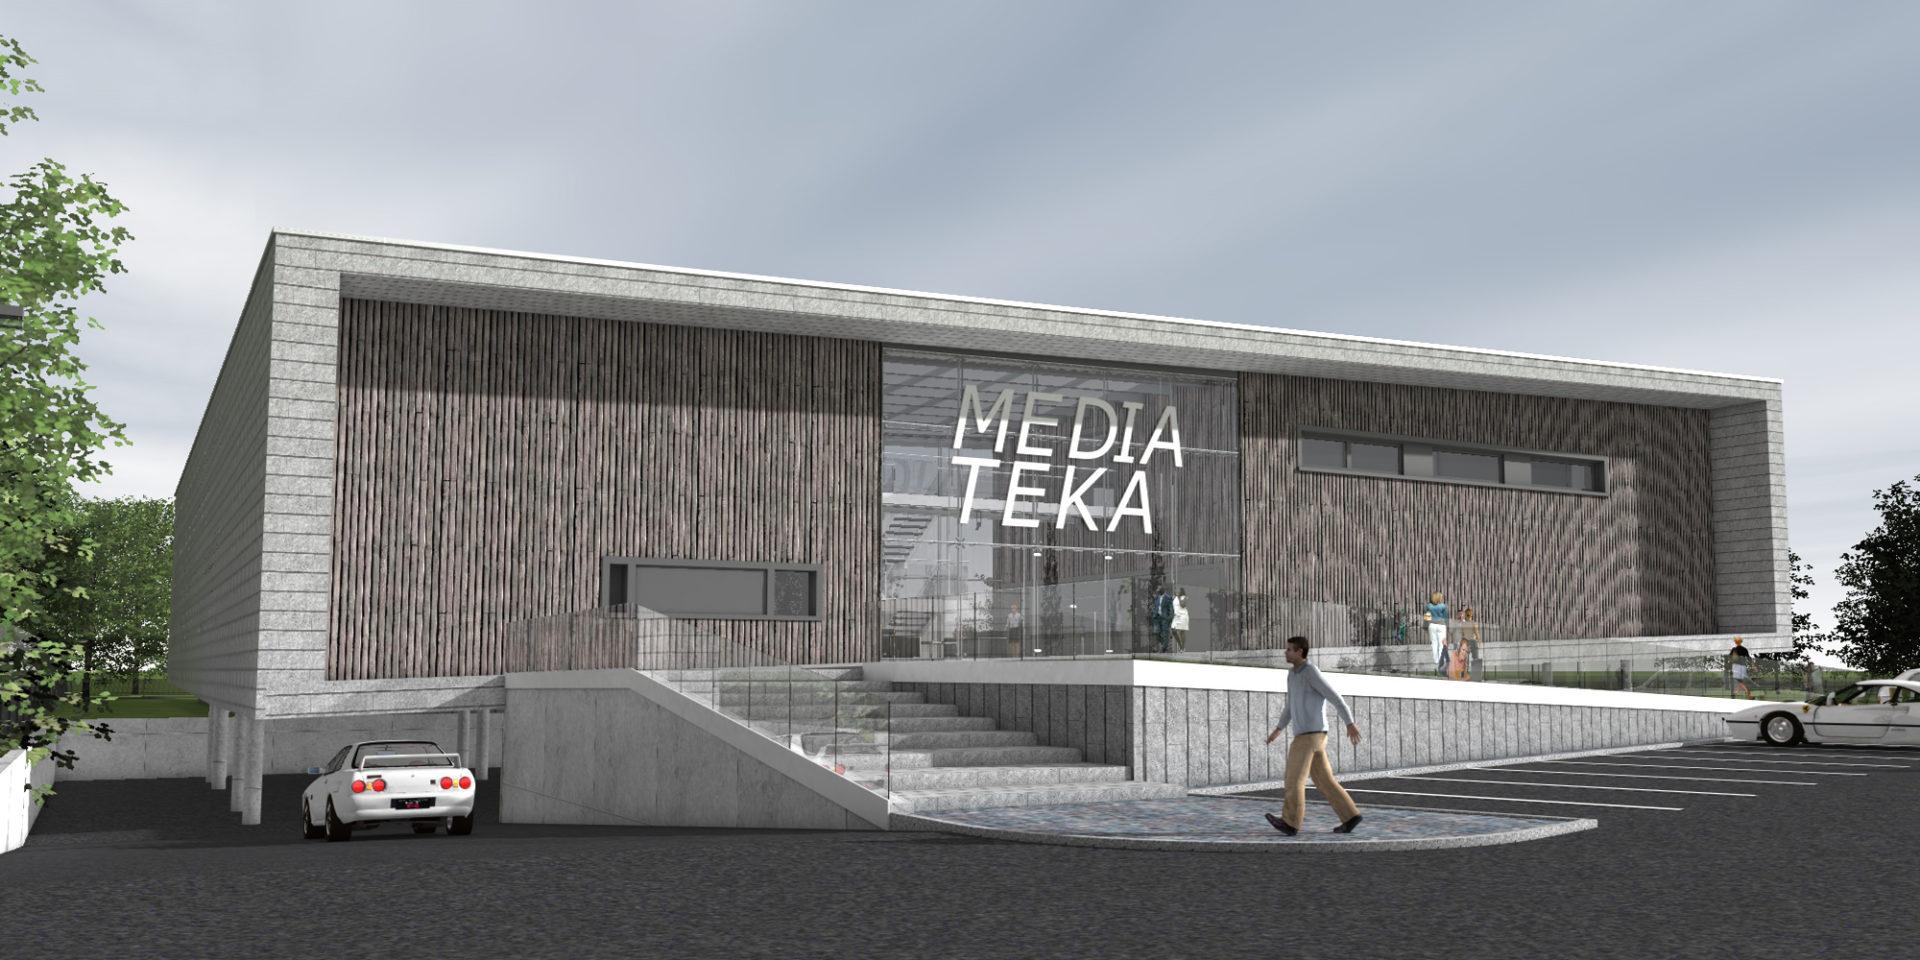 2013 – Mediateka